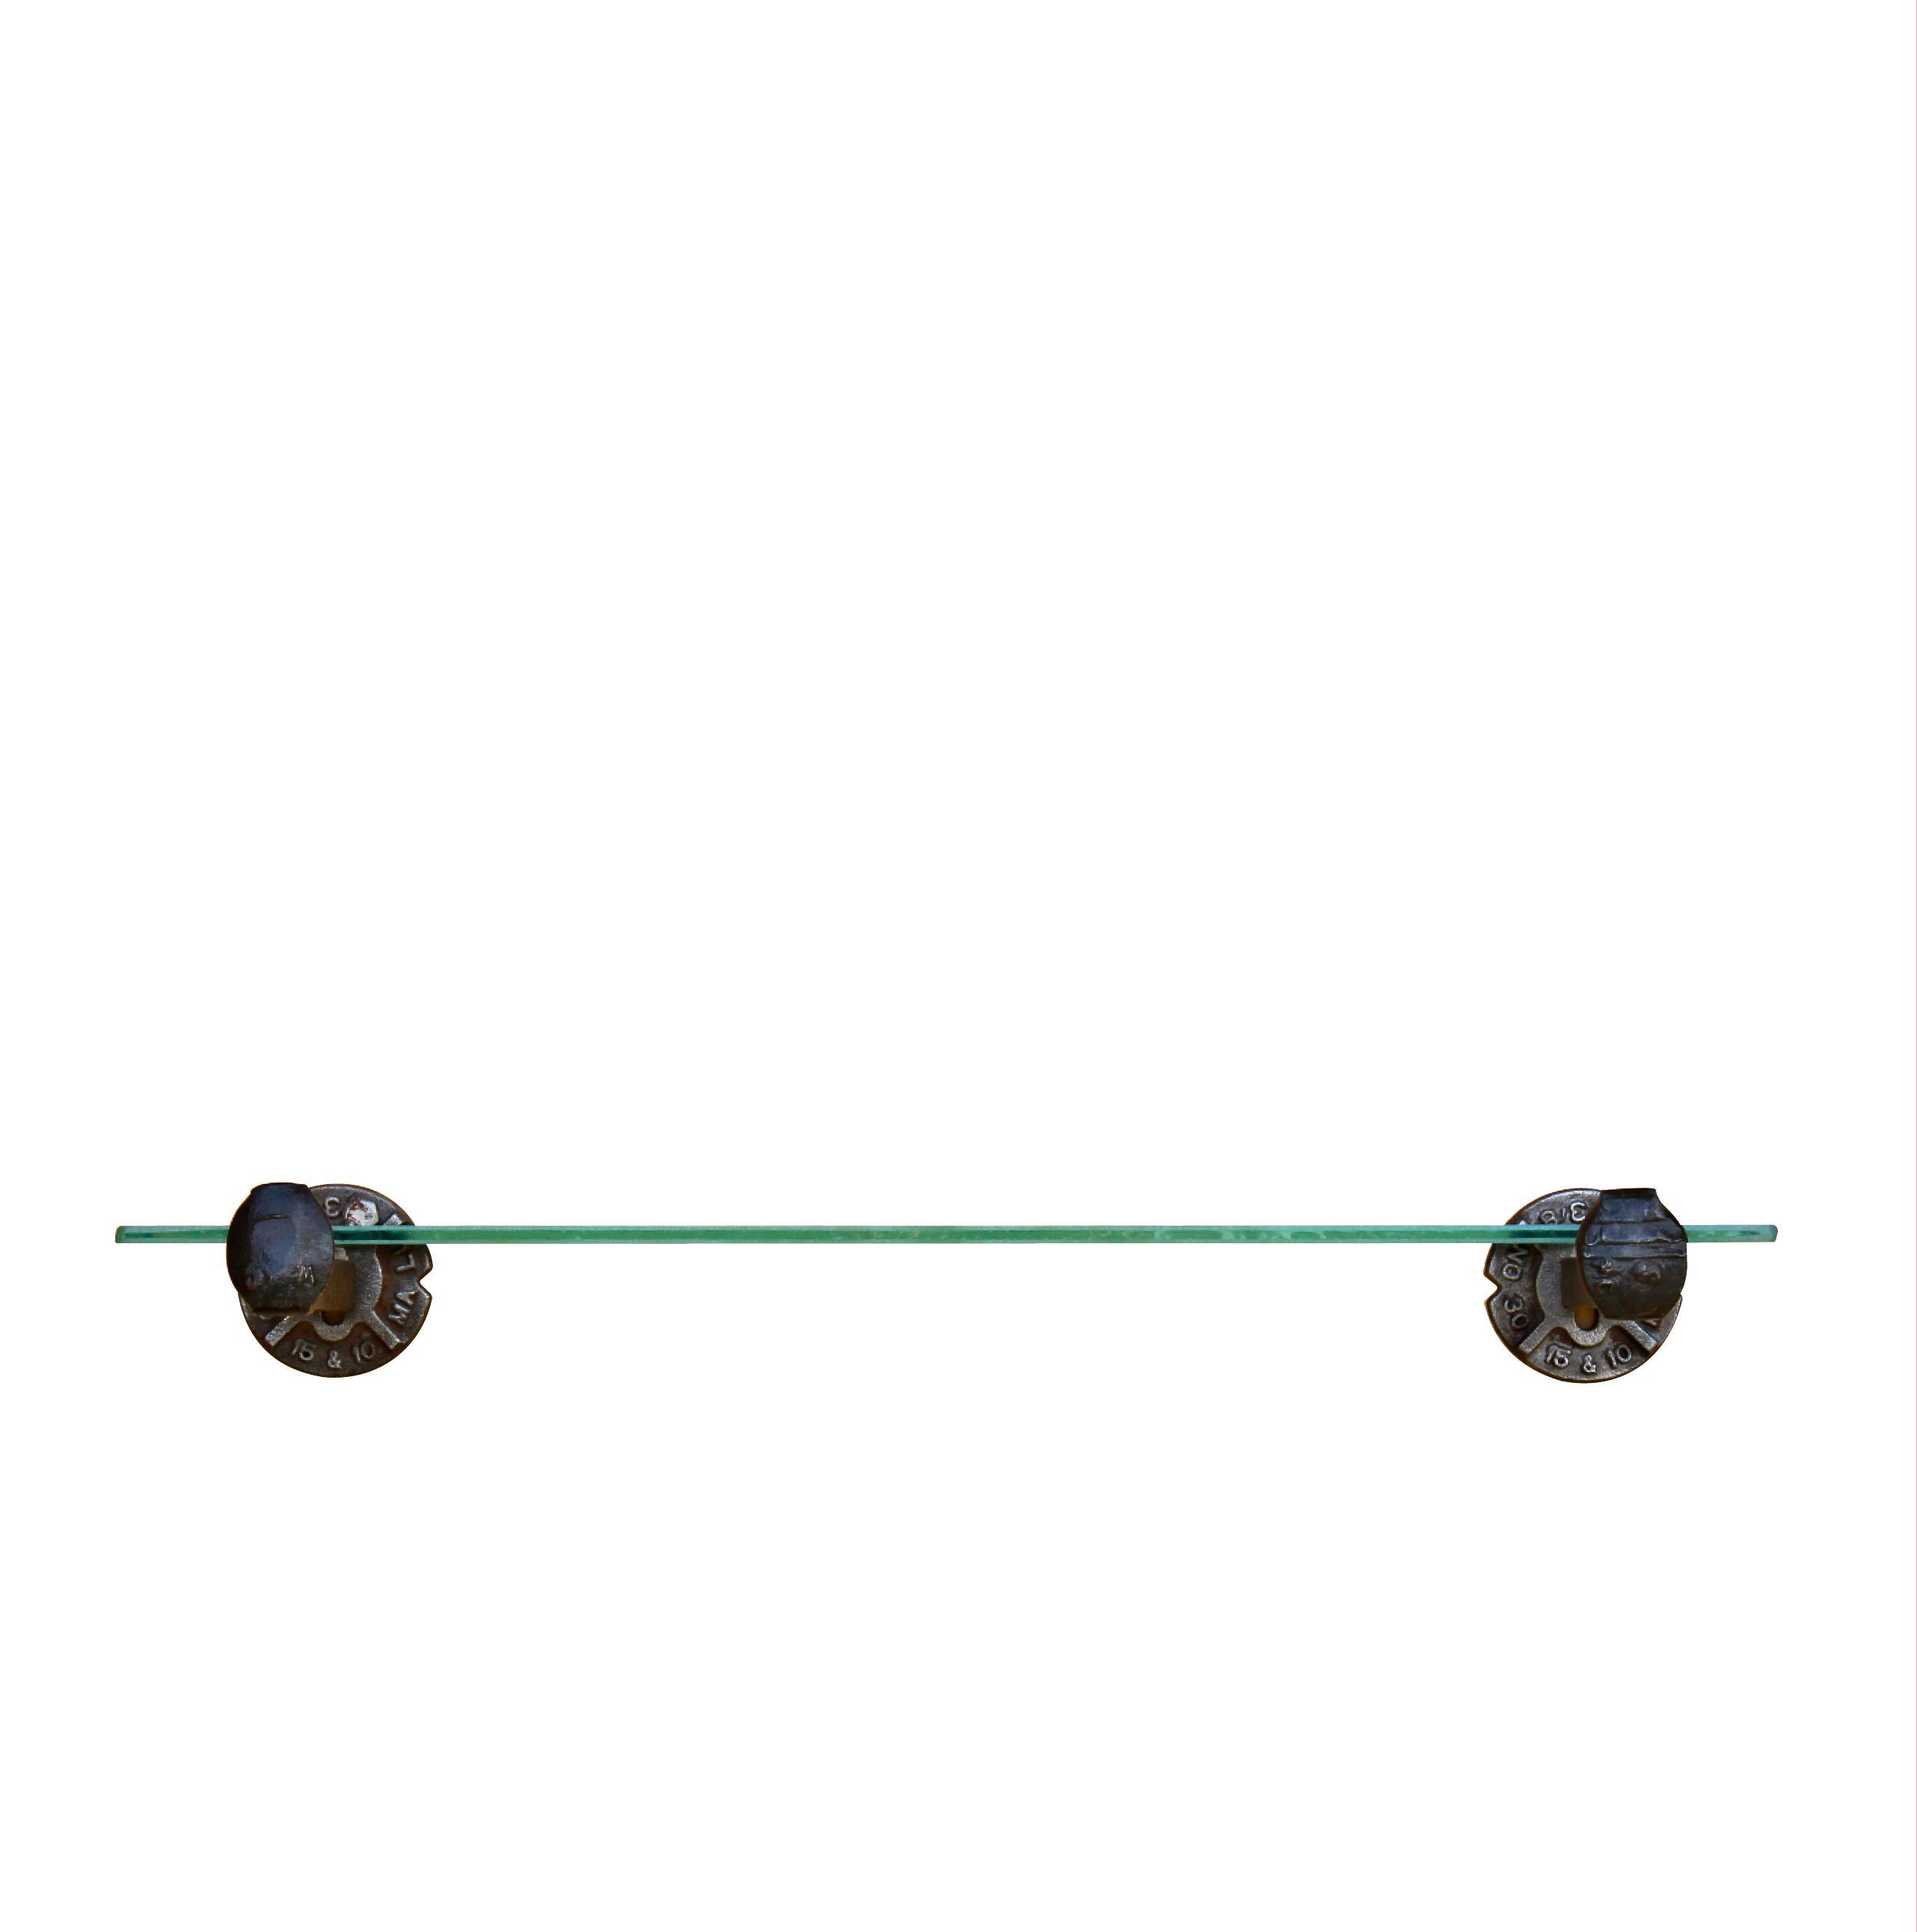 railroad spike shelf